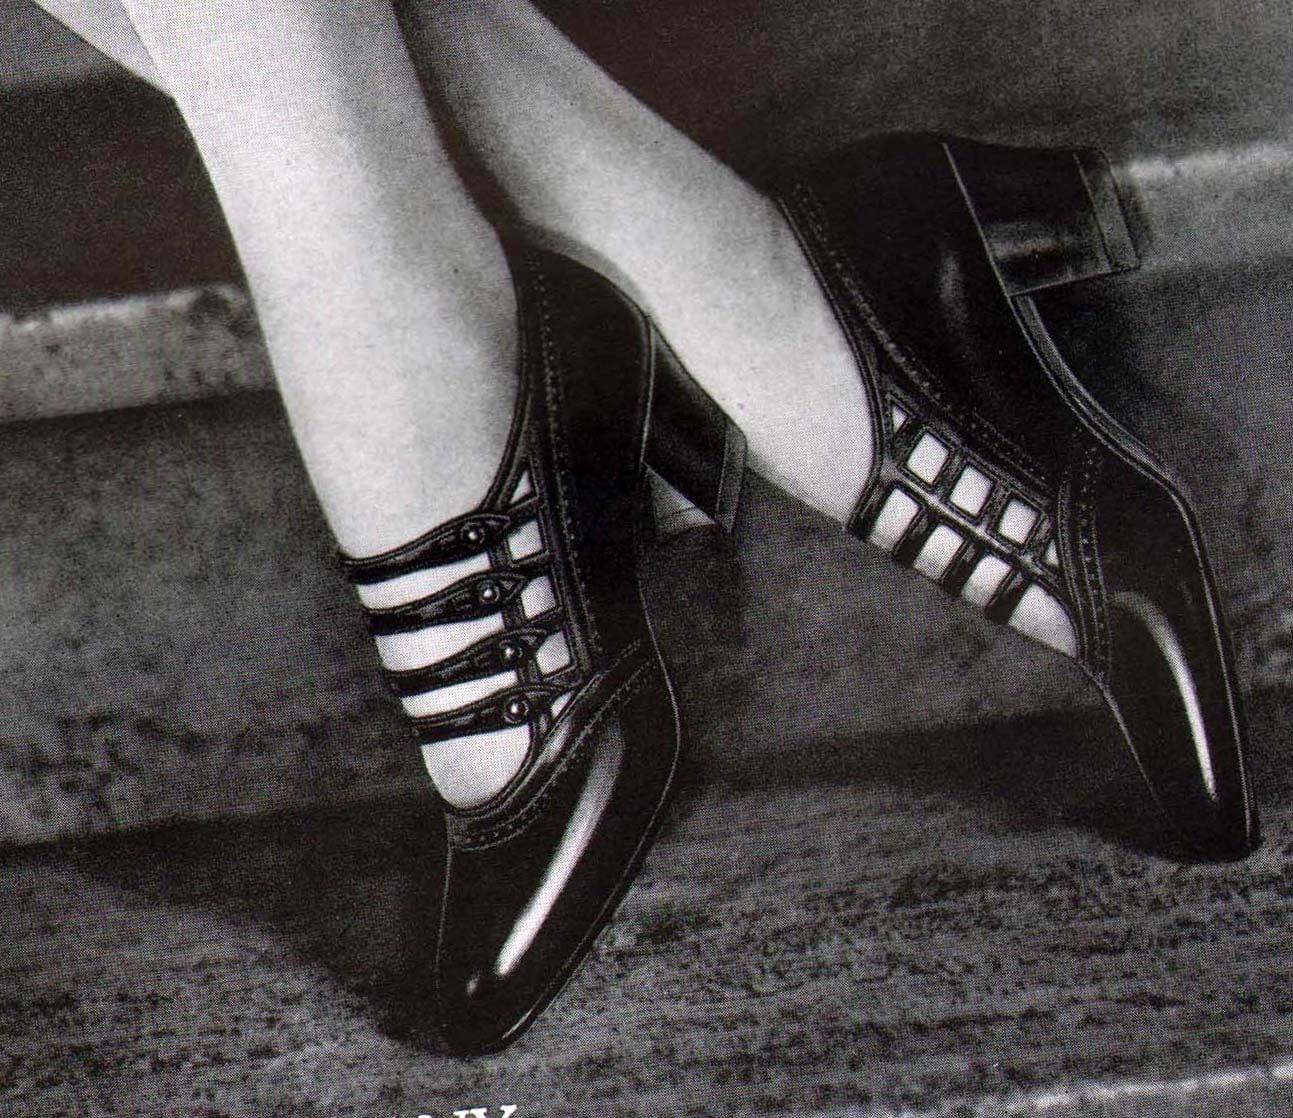 Ritz Shoe Fashions Flapper Girls Roaring Twenties Vintage Art